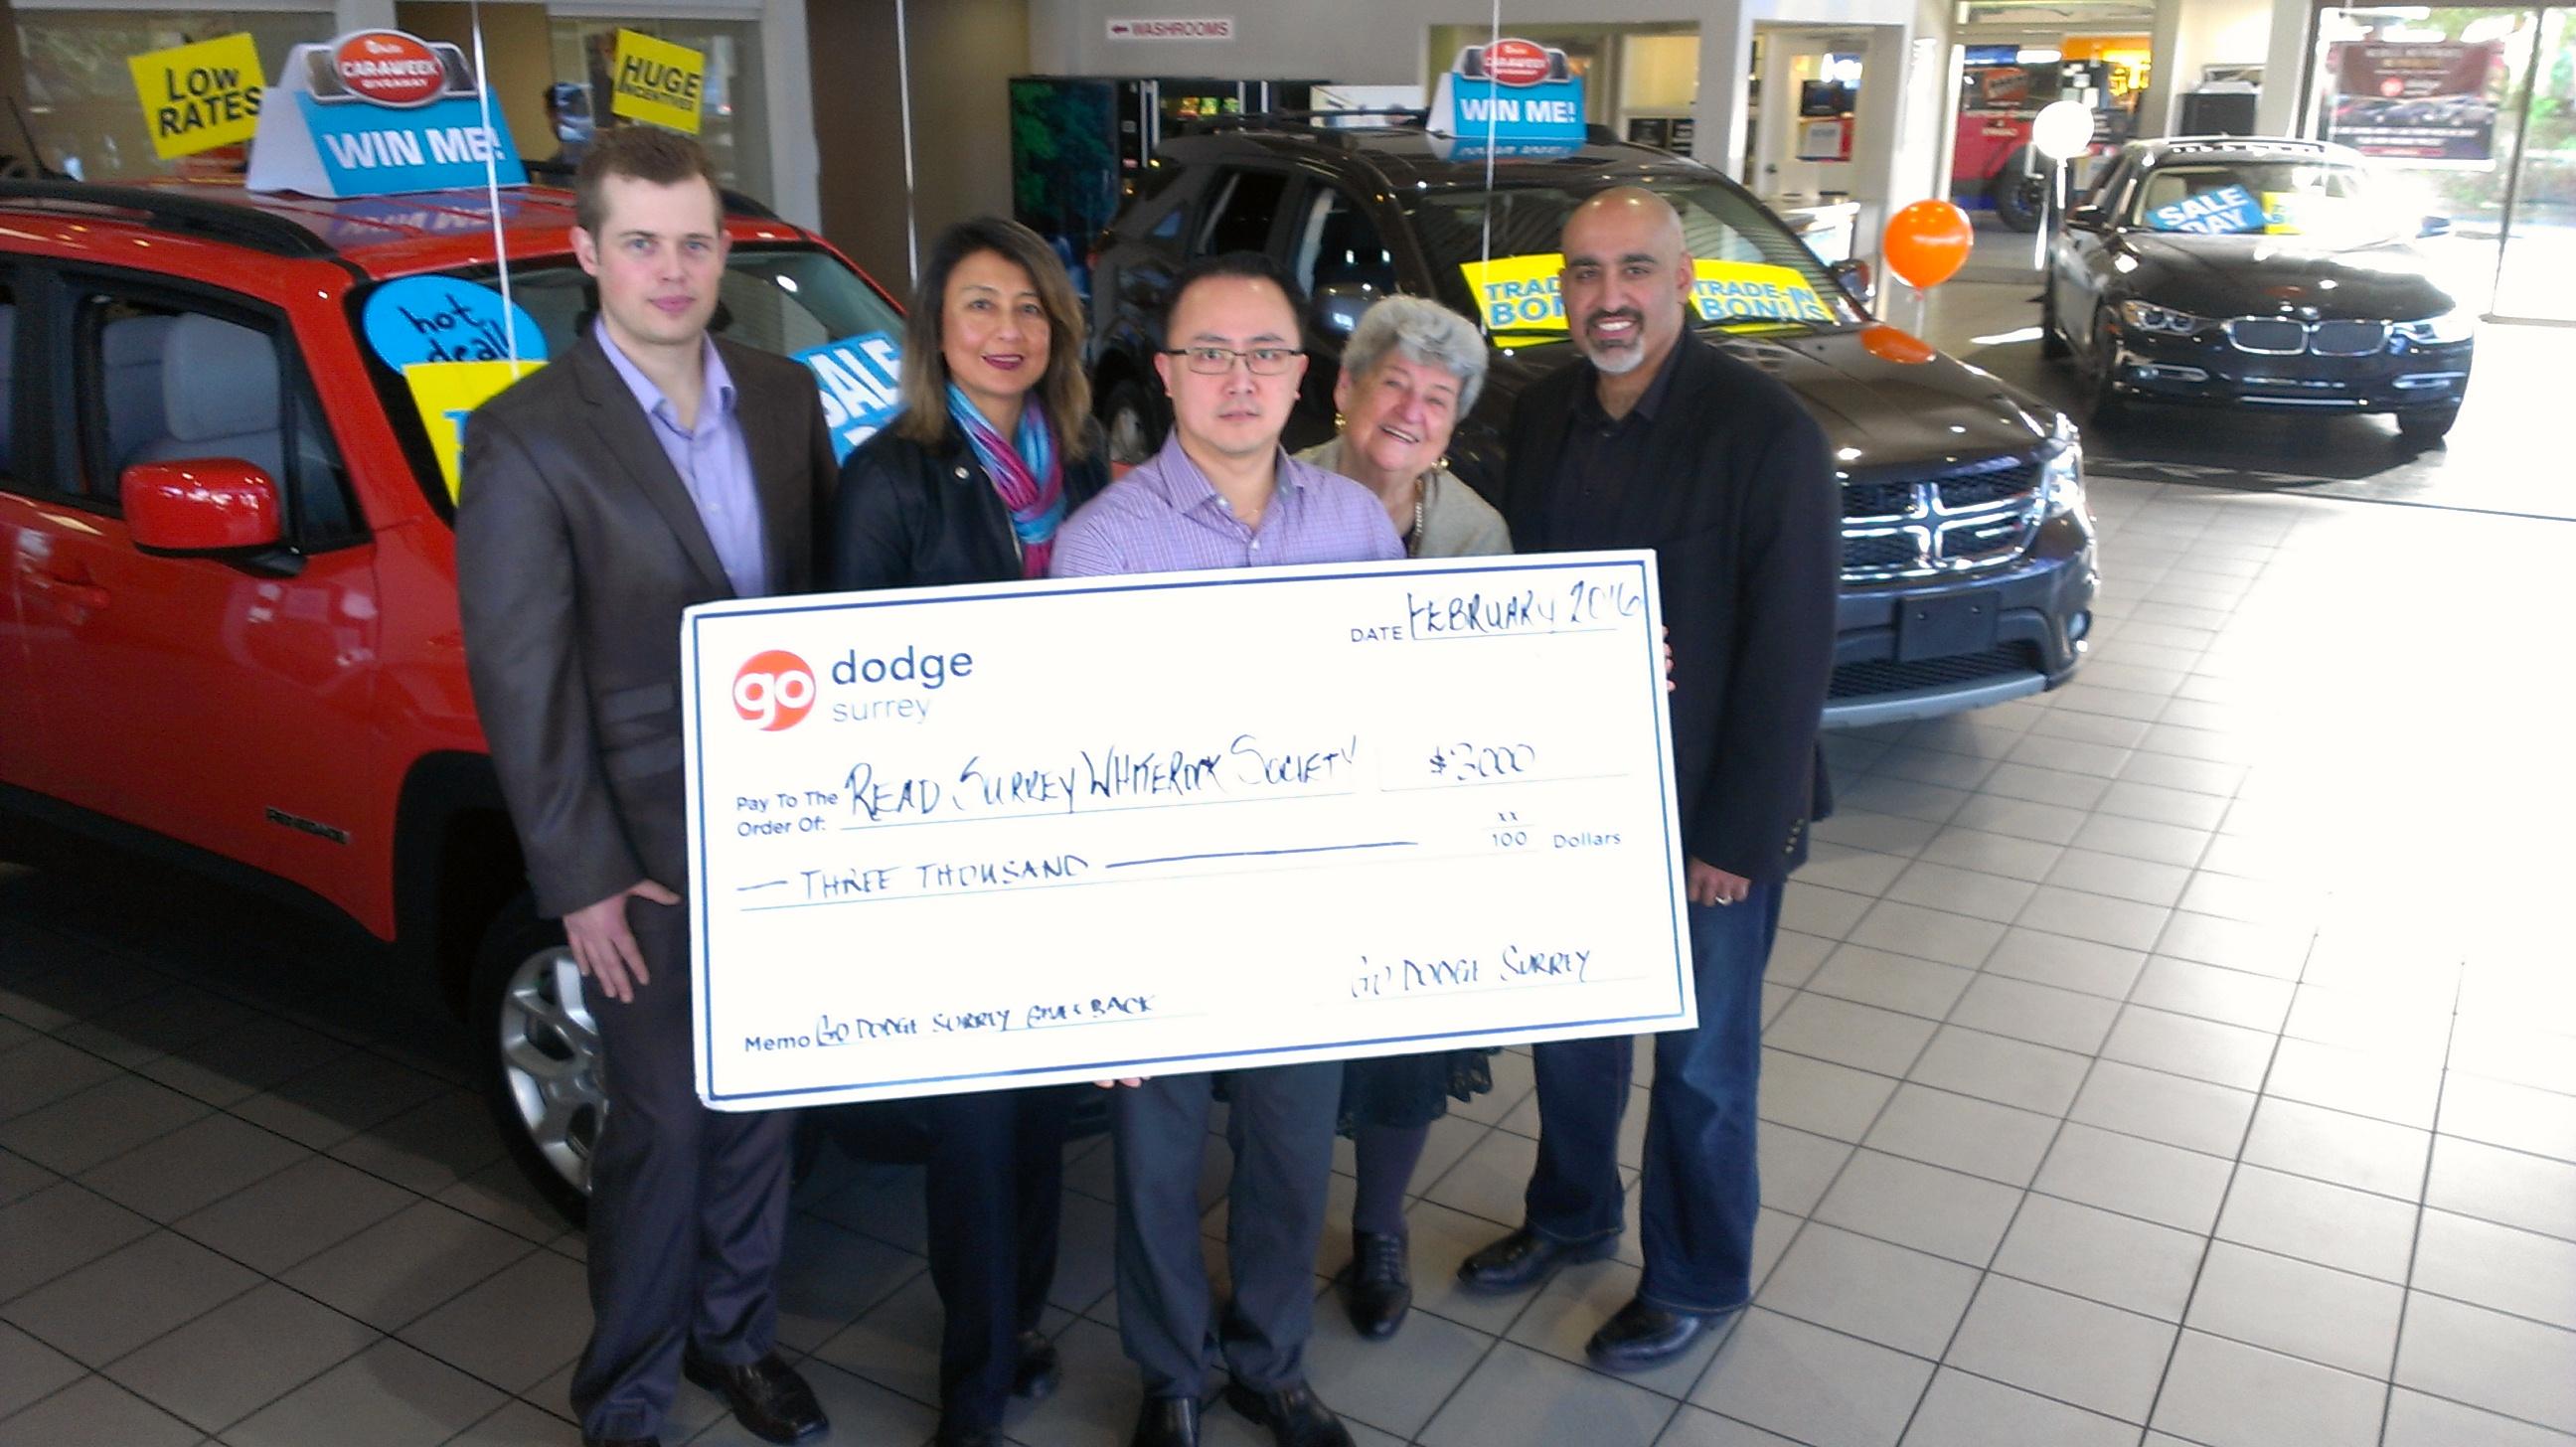 Go Dodge Surrey Community Donation